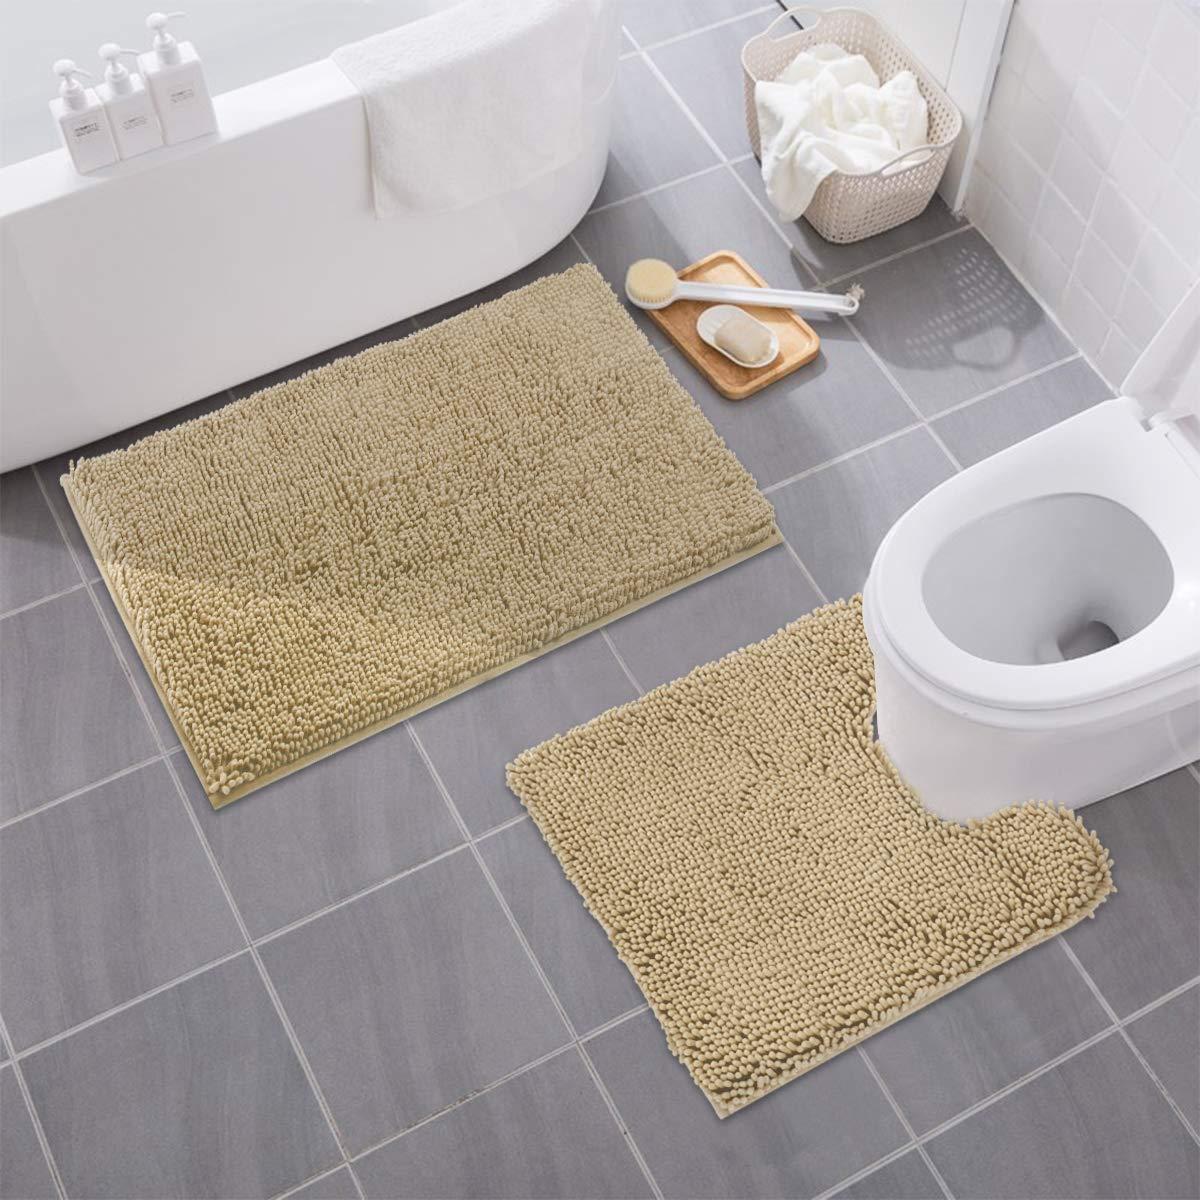 "MAYSHINE Bathroom Rug Toilet Sets and Shaggy Non Slip Machine Washable Soft Microfiber Bath Contour mat (Beige,32"" 20""/20"" 20"" U-Shaped)"